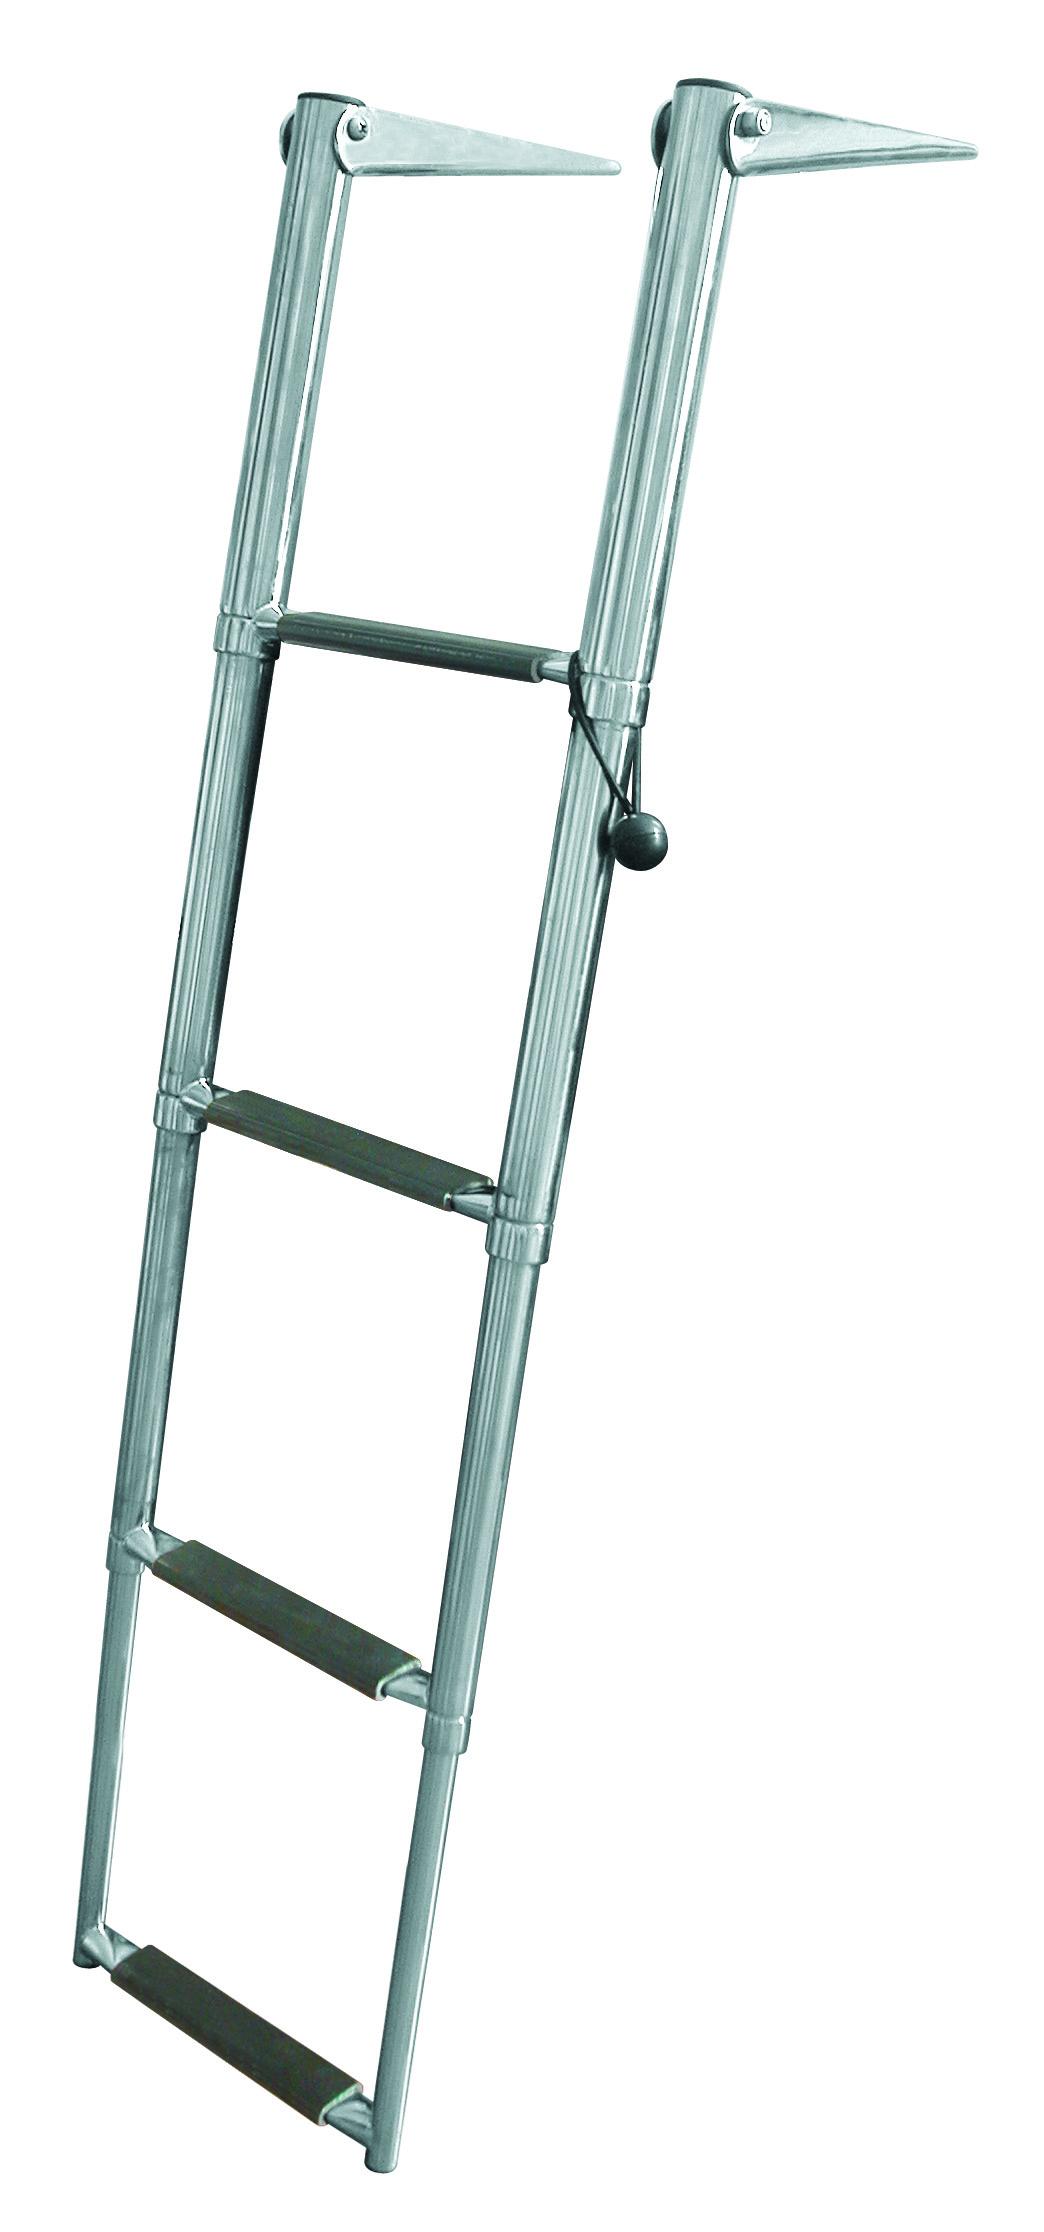 Jif Marine Slide Mount Transom Ladder With 4 Steps